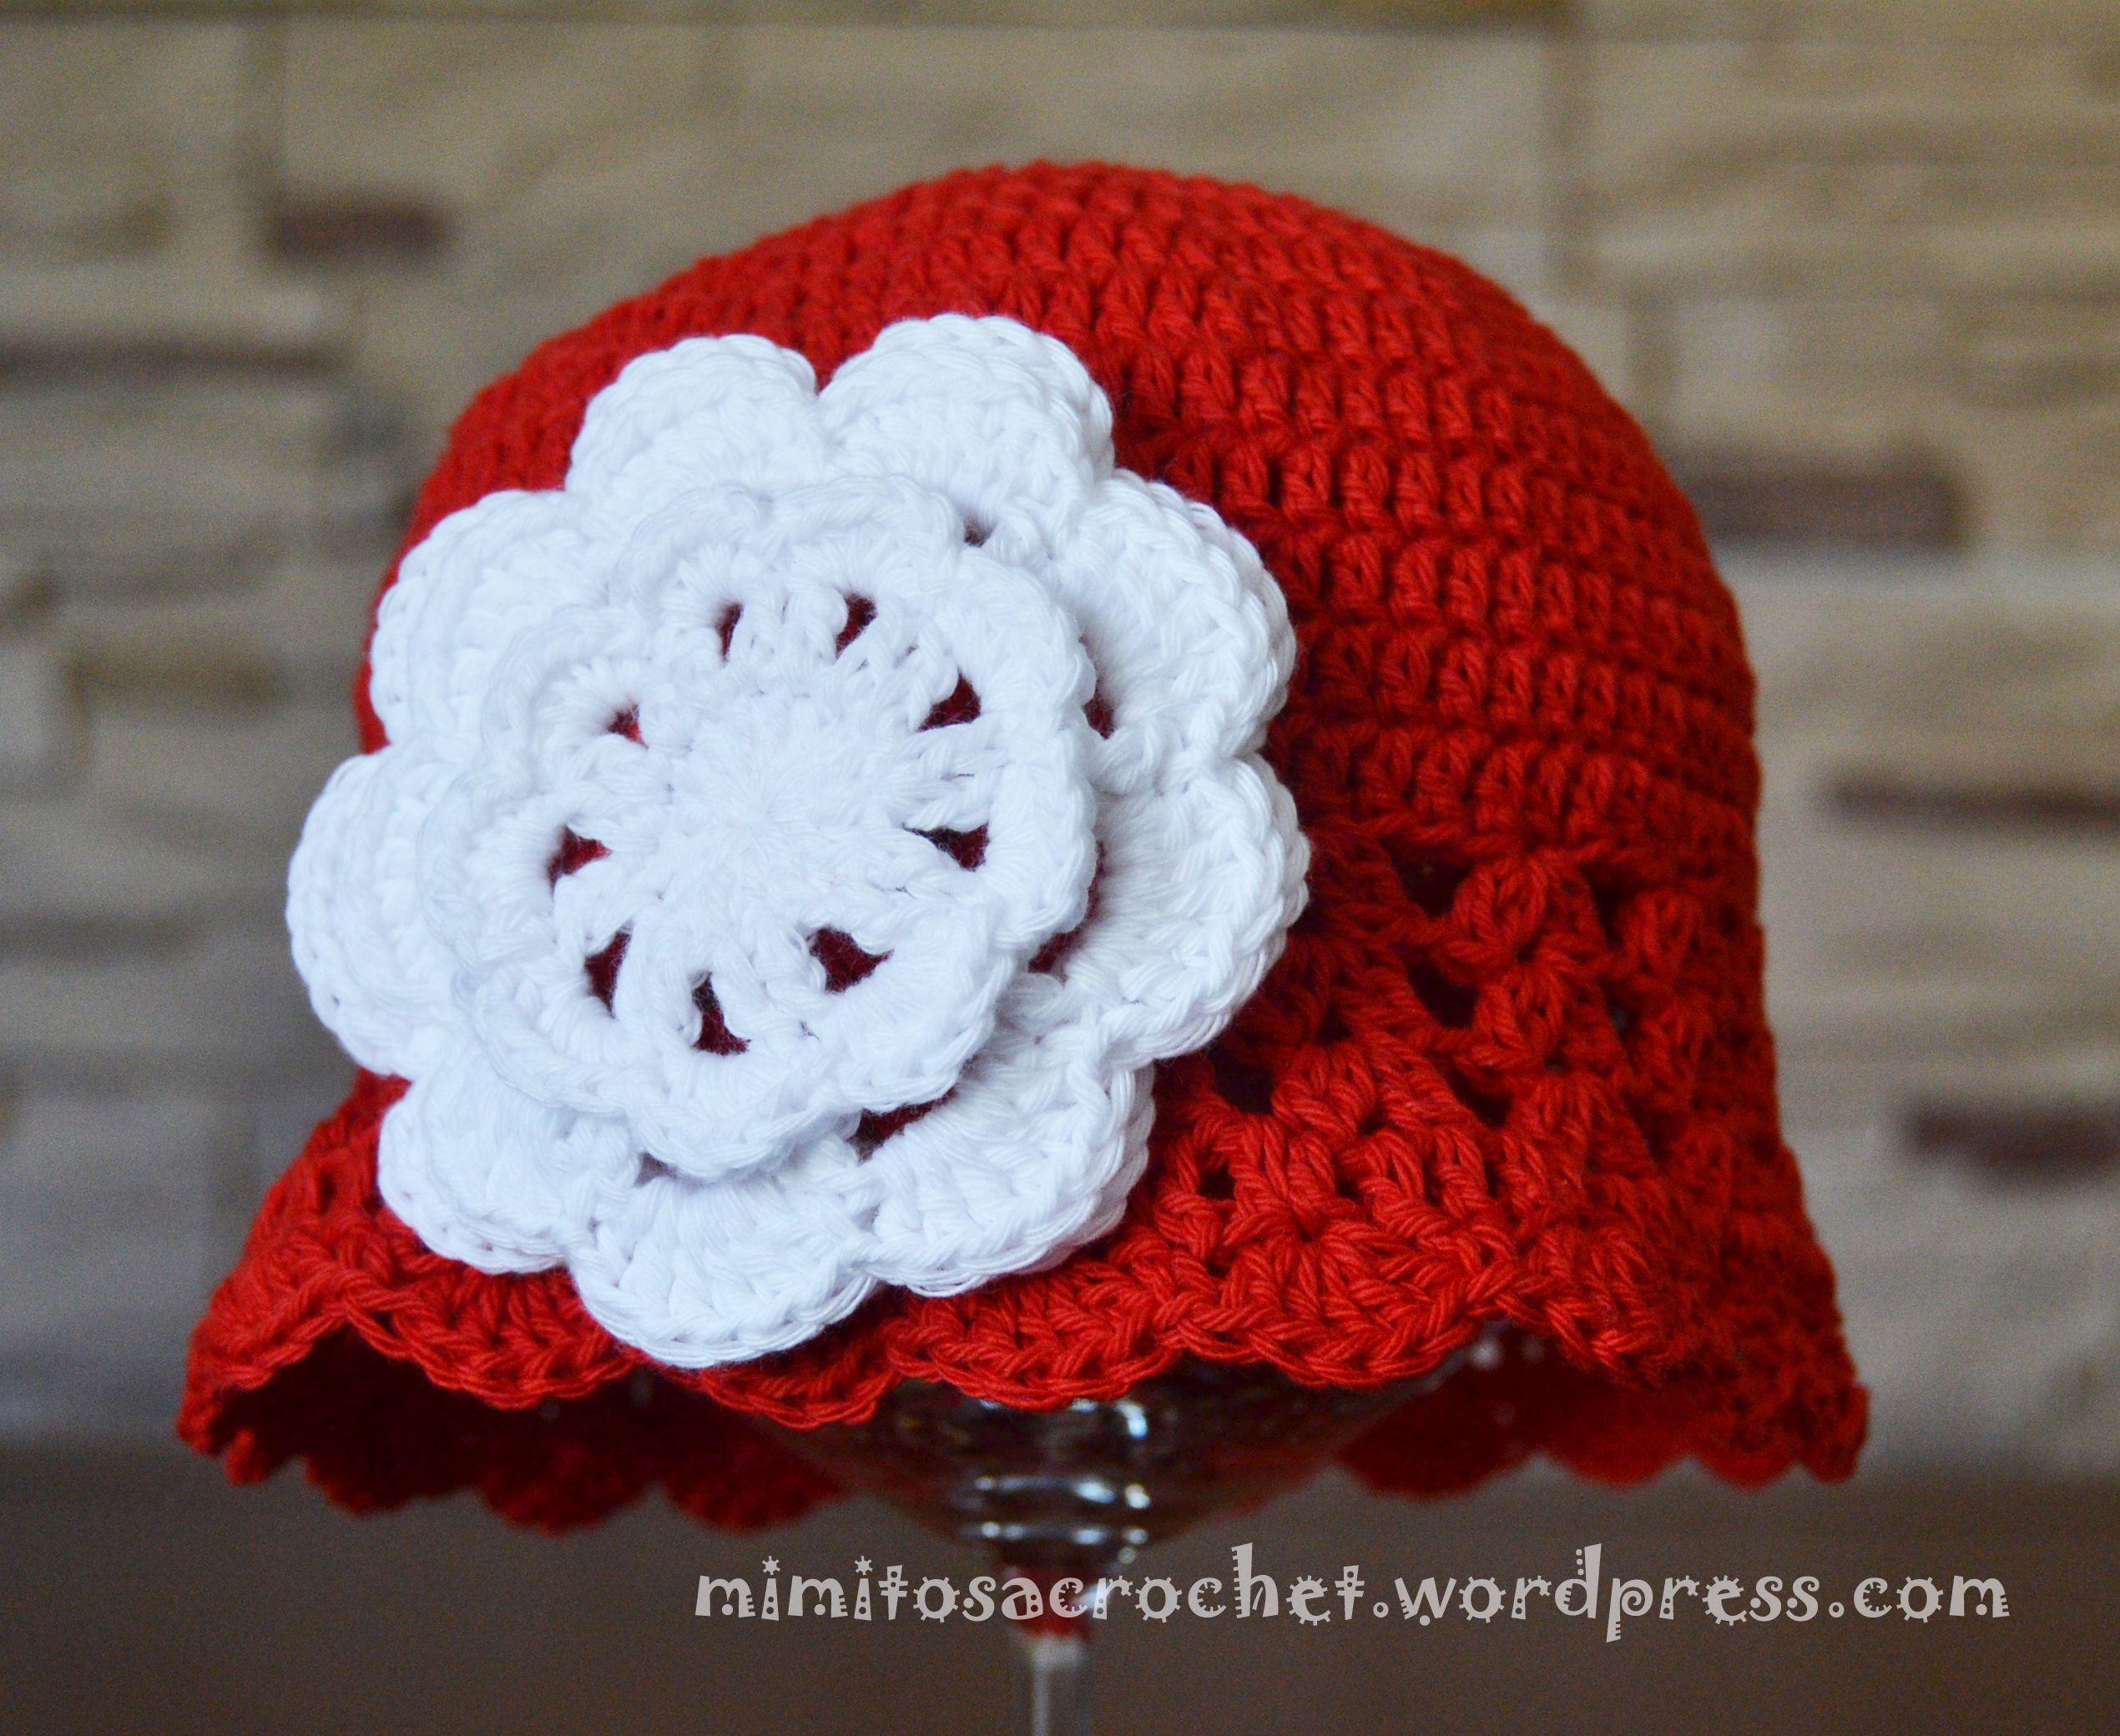 Gorro Zoe rojo flor blanca - 1-3 anni | BABY HAT 1 | Pinterest ...